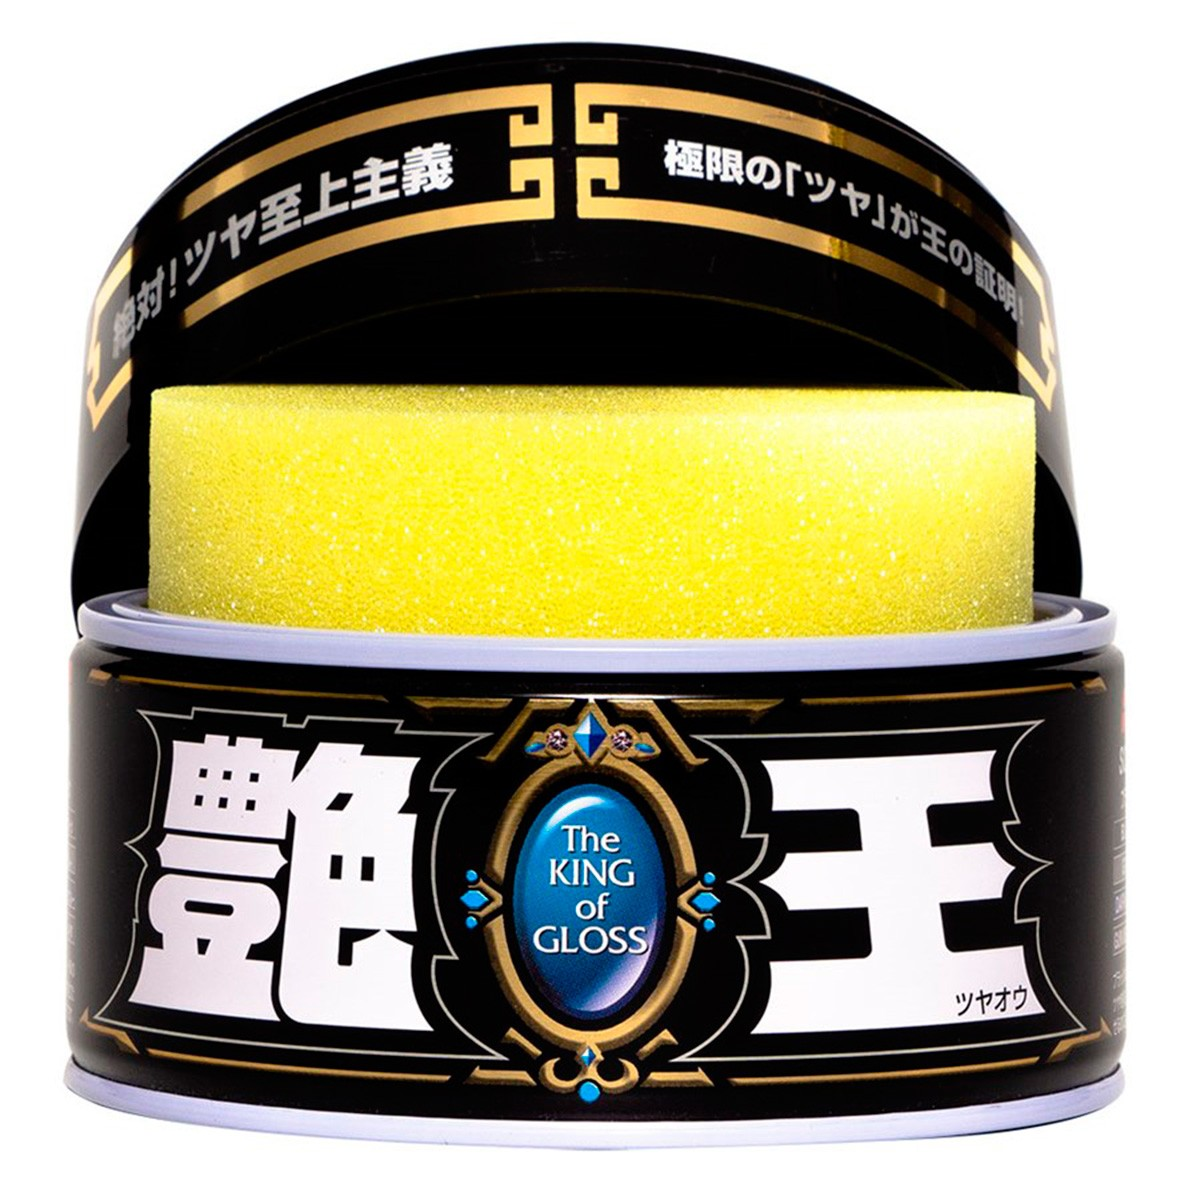 Cera King Of Gloss Black 300g C/ Boné Limited Edition - Soft99